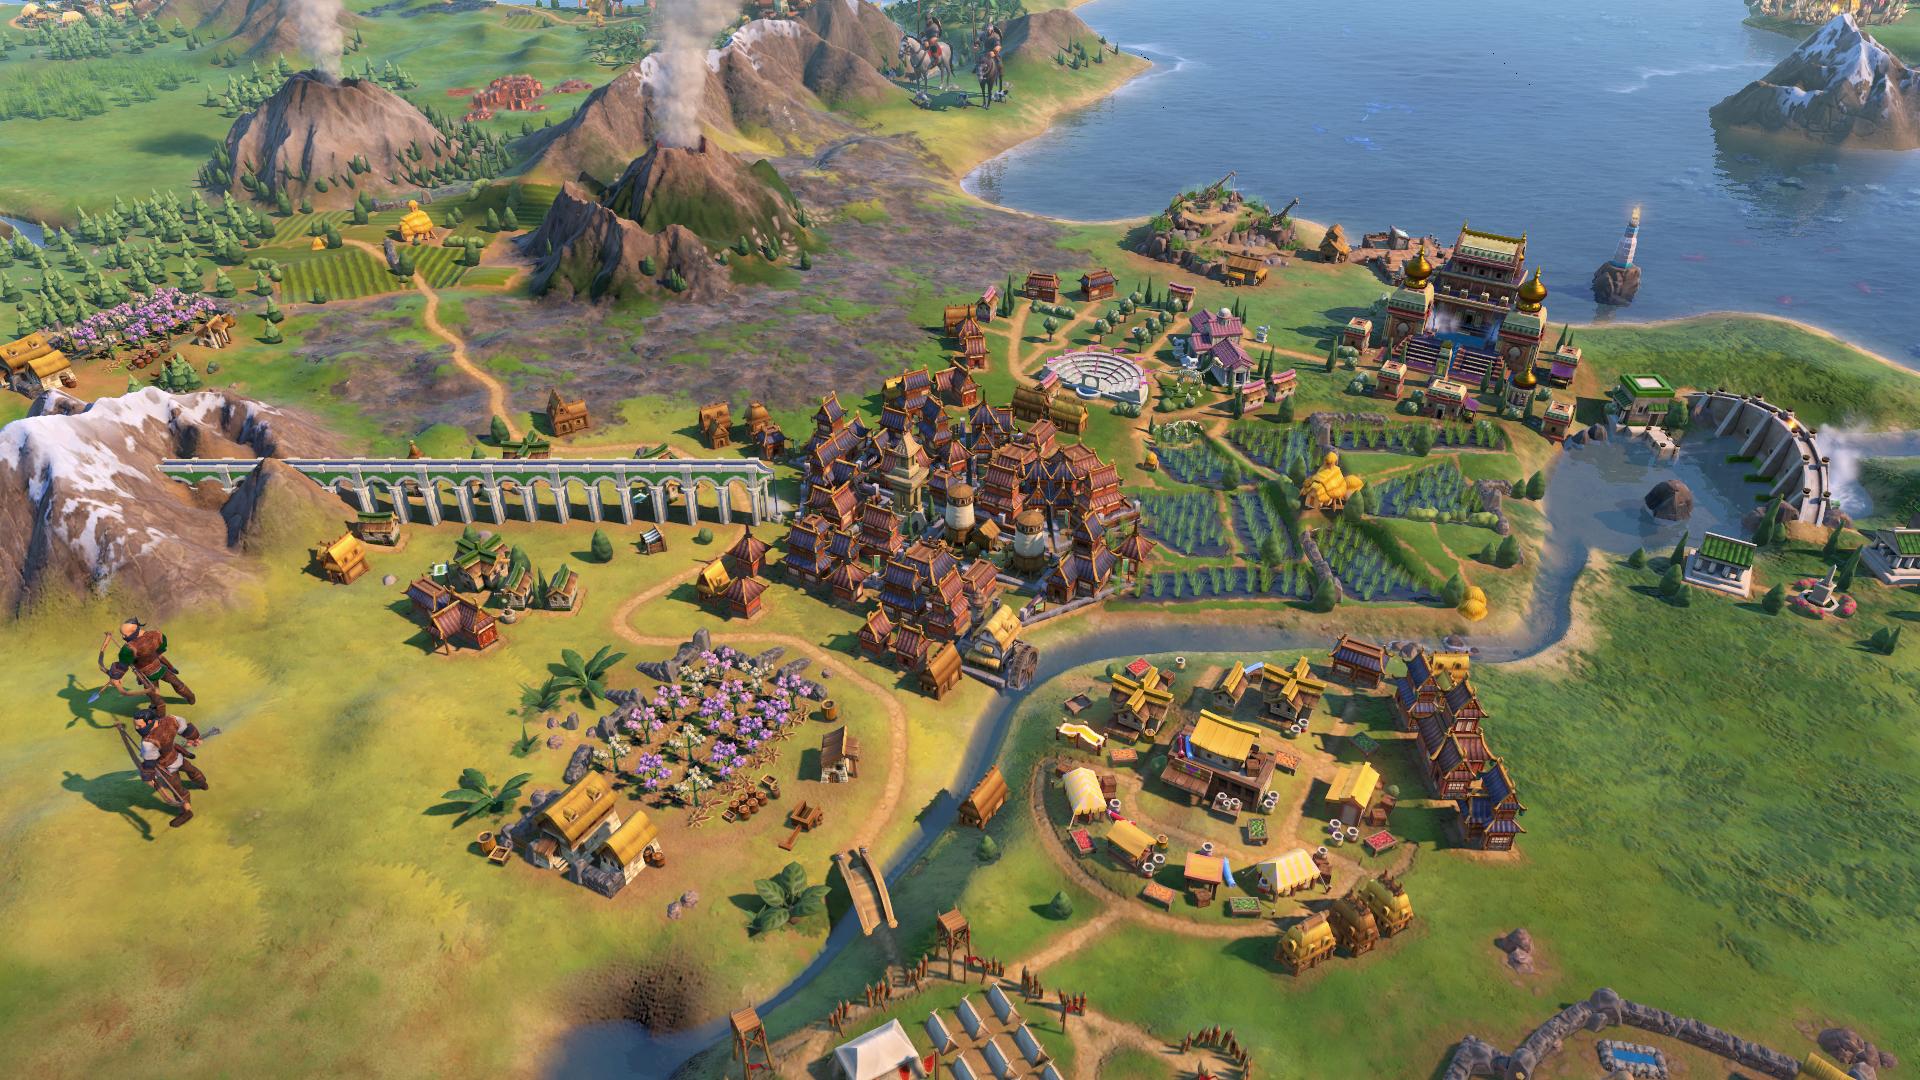 Игра Civilization VI выйдет 22 ноября 2019 на PS4 и Xbox One.